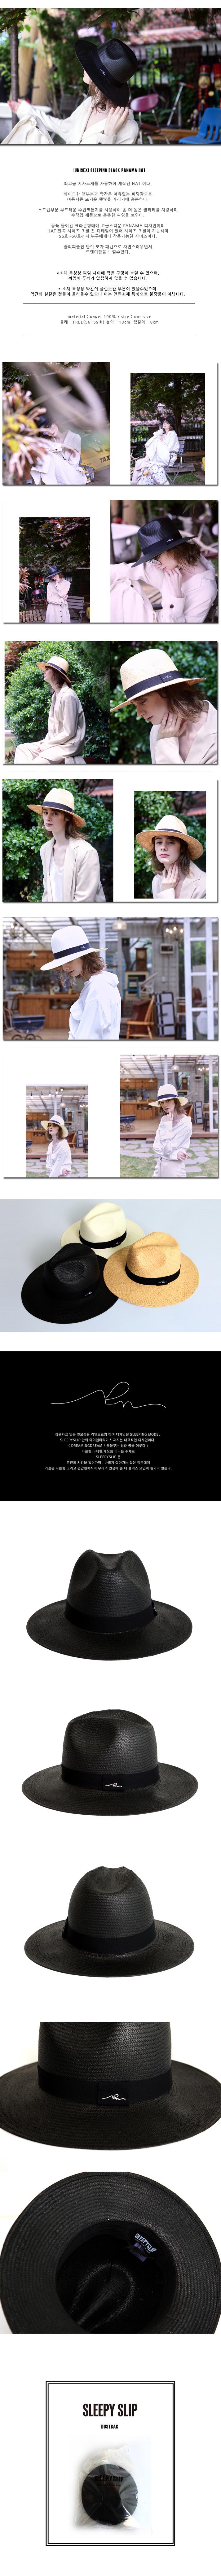 sleeping-black-panama-hat.jpg